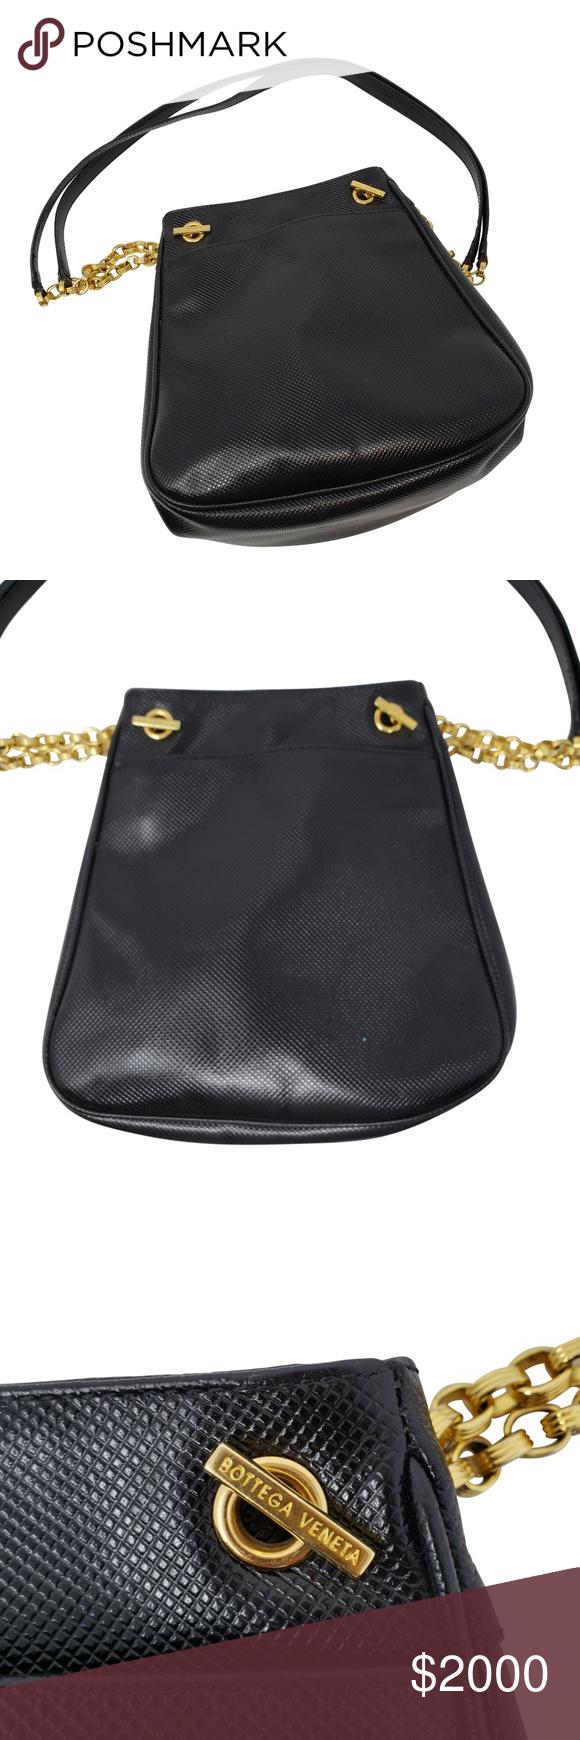 Bottiga Veneta Italy Black Bucket Handbag Visual Authentication Done Next Step Is The Certificate Of Authenticity Which I Ll Have Crossbody Bag Bucket Handbags Black Bucket